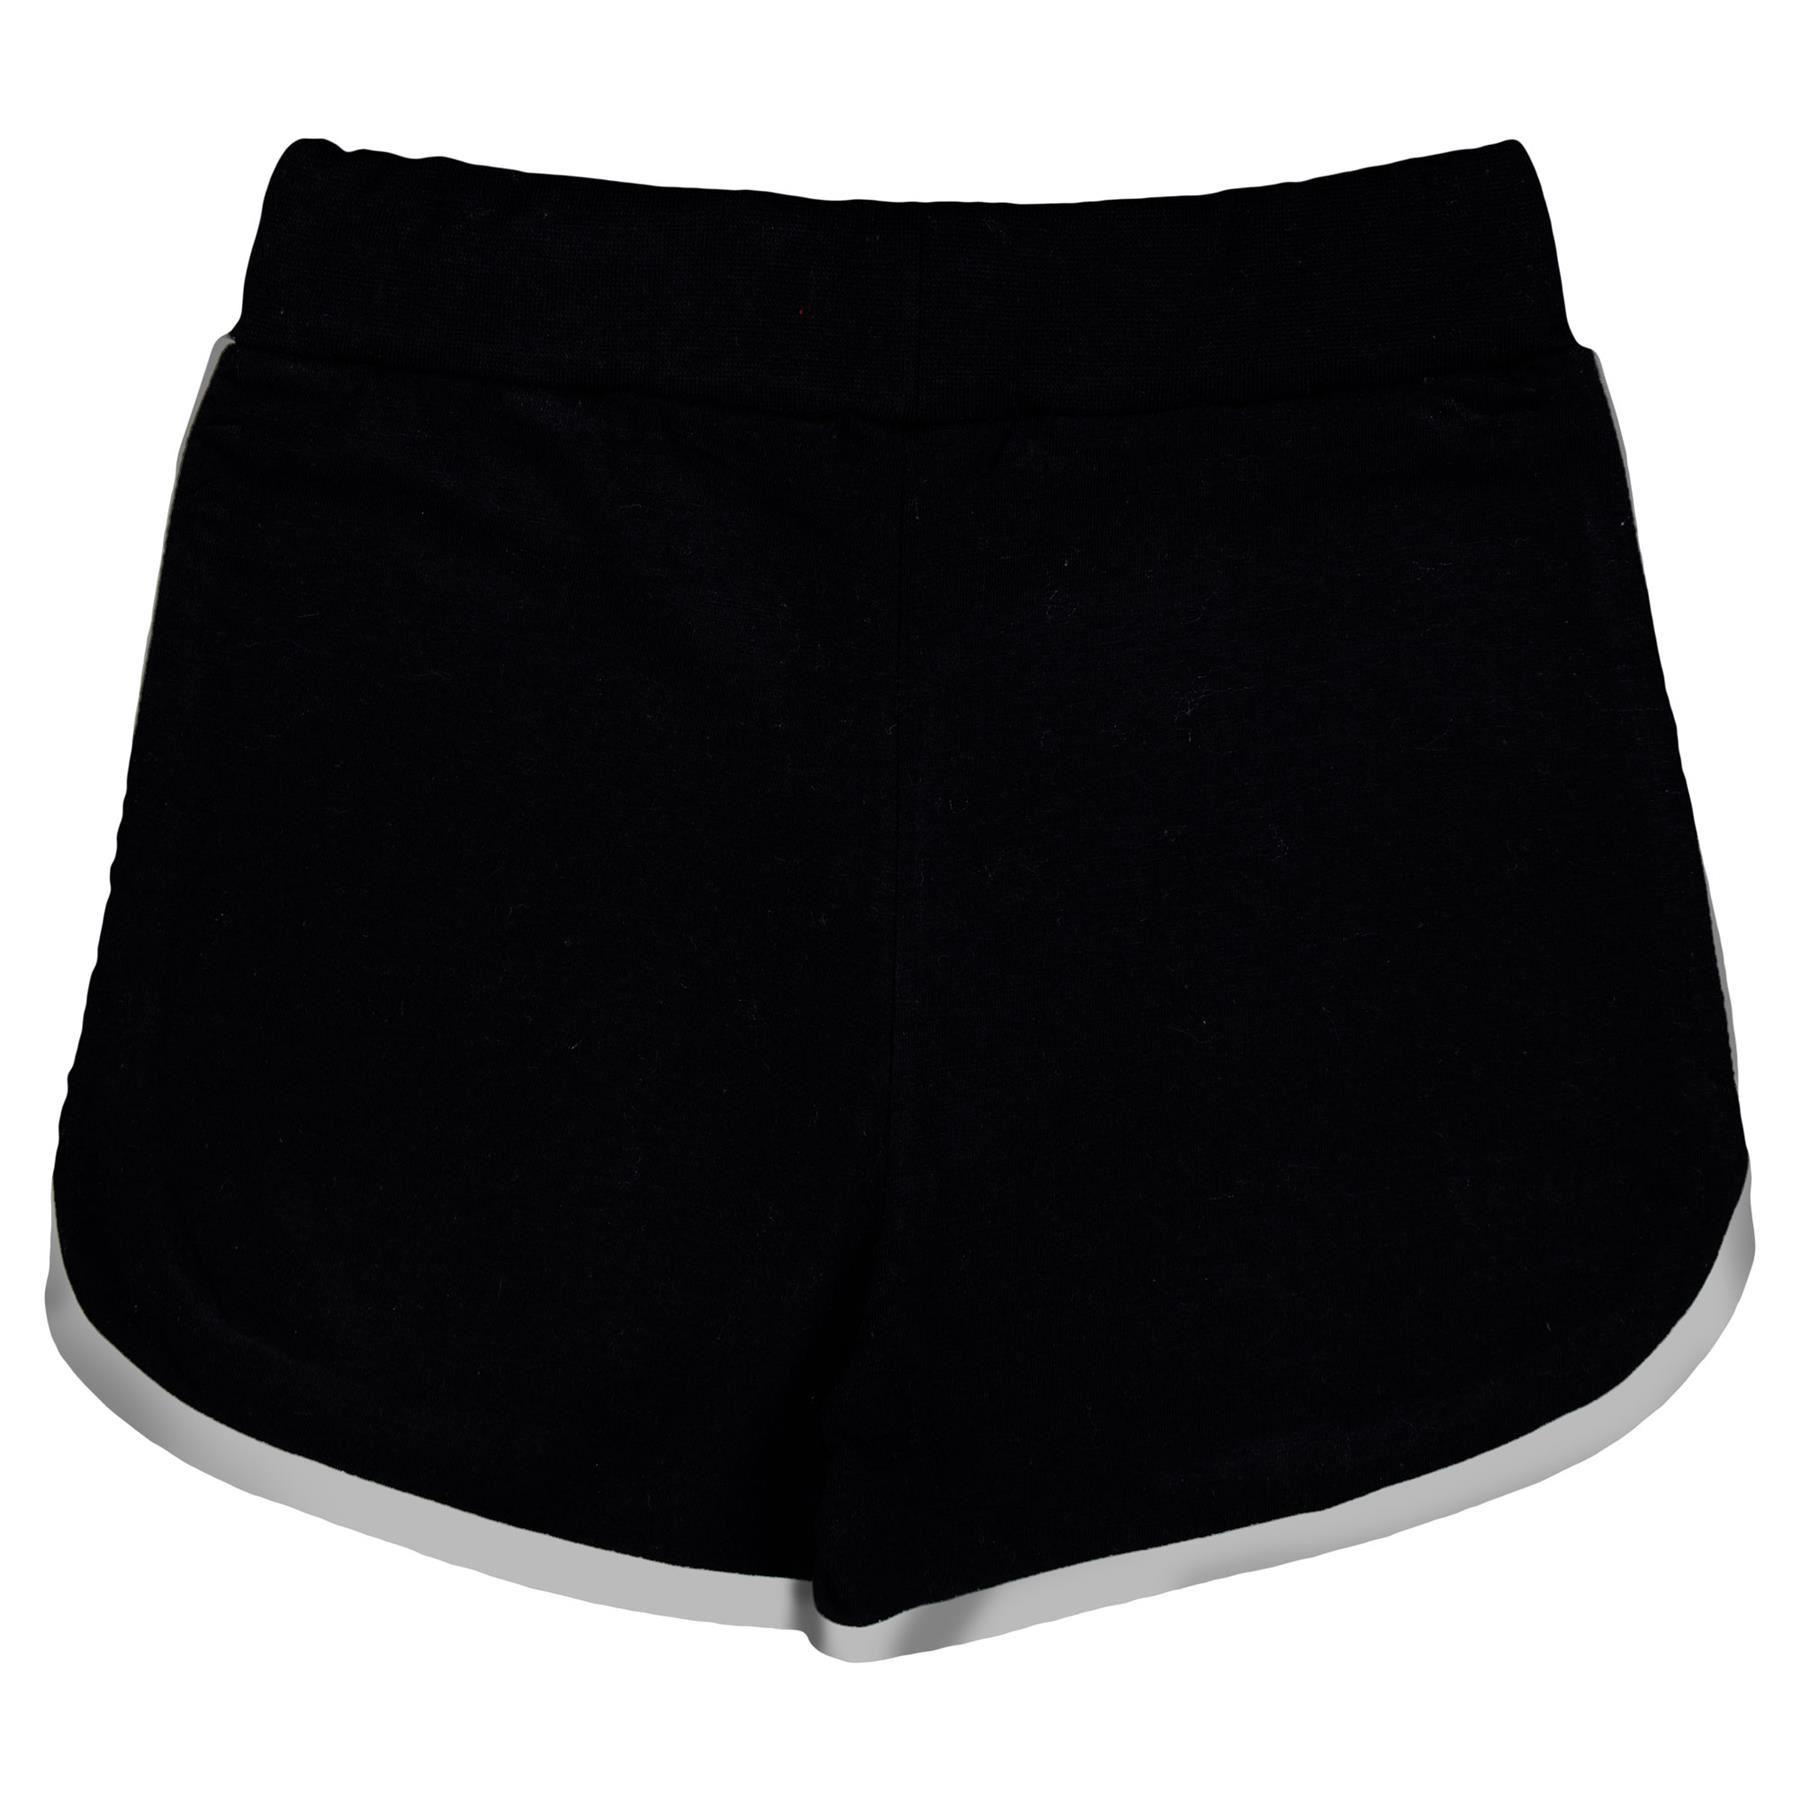 Kids-Girls-Shorts-100-Cotton-Dance-Gym-Sports-Summer-Hot-Short-Pants-2-13-Years Indexbild 6